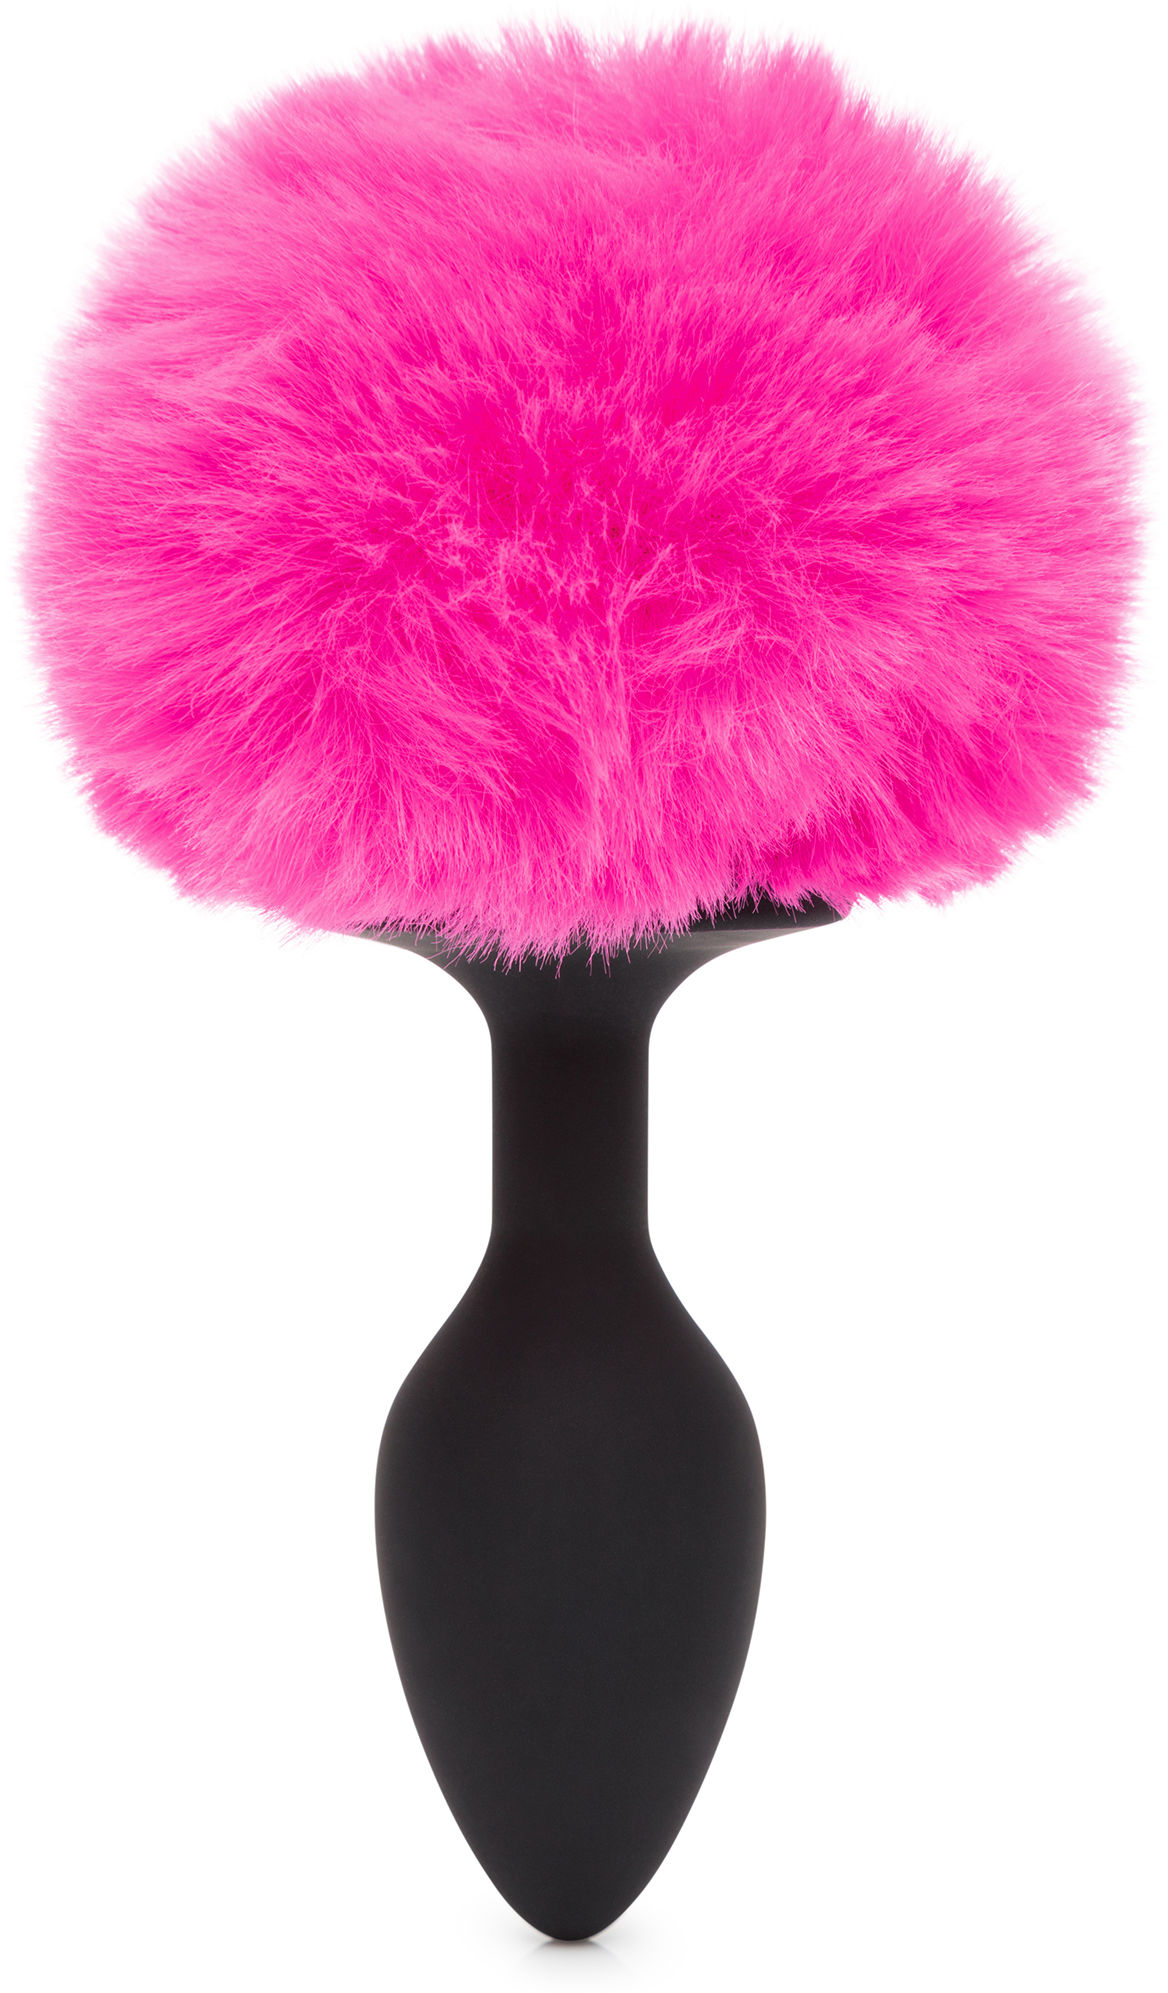 Happy Rabbit Butt Plug Black-Pink Small